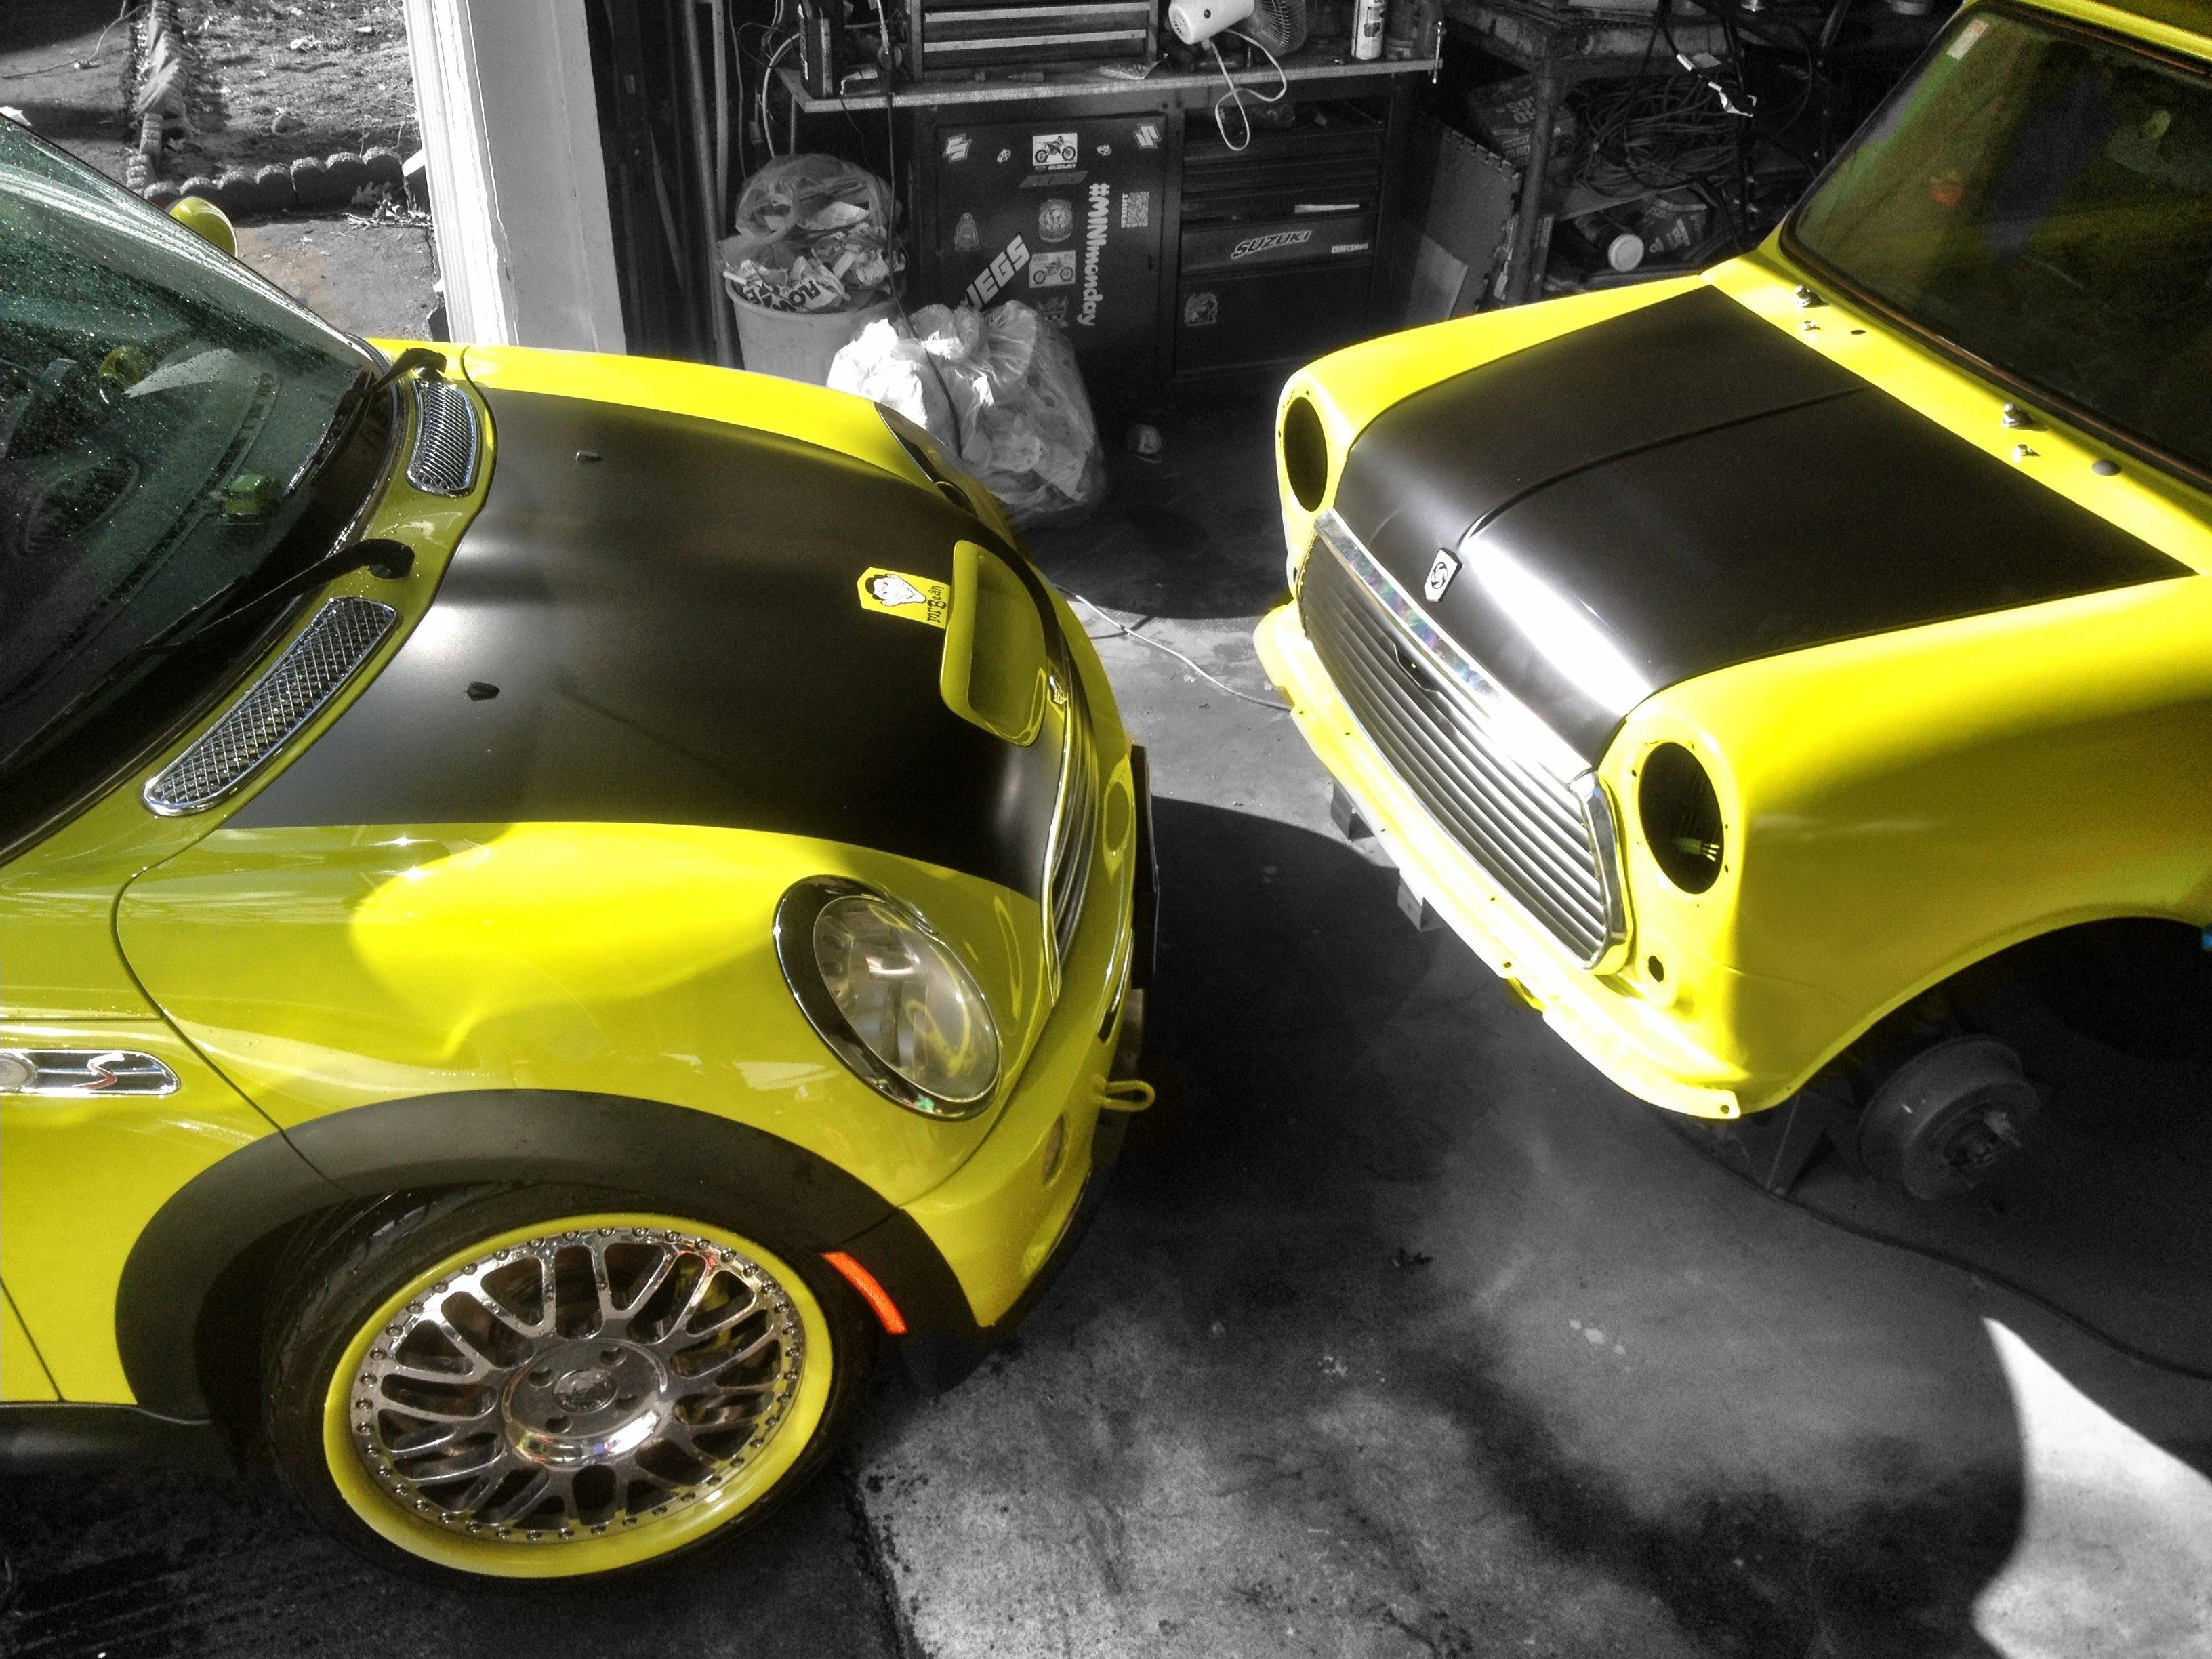 The new Mr. Beanmobile Mini Cooper checking up on the progress of the Classic Mr. Bean replica.